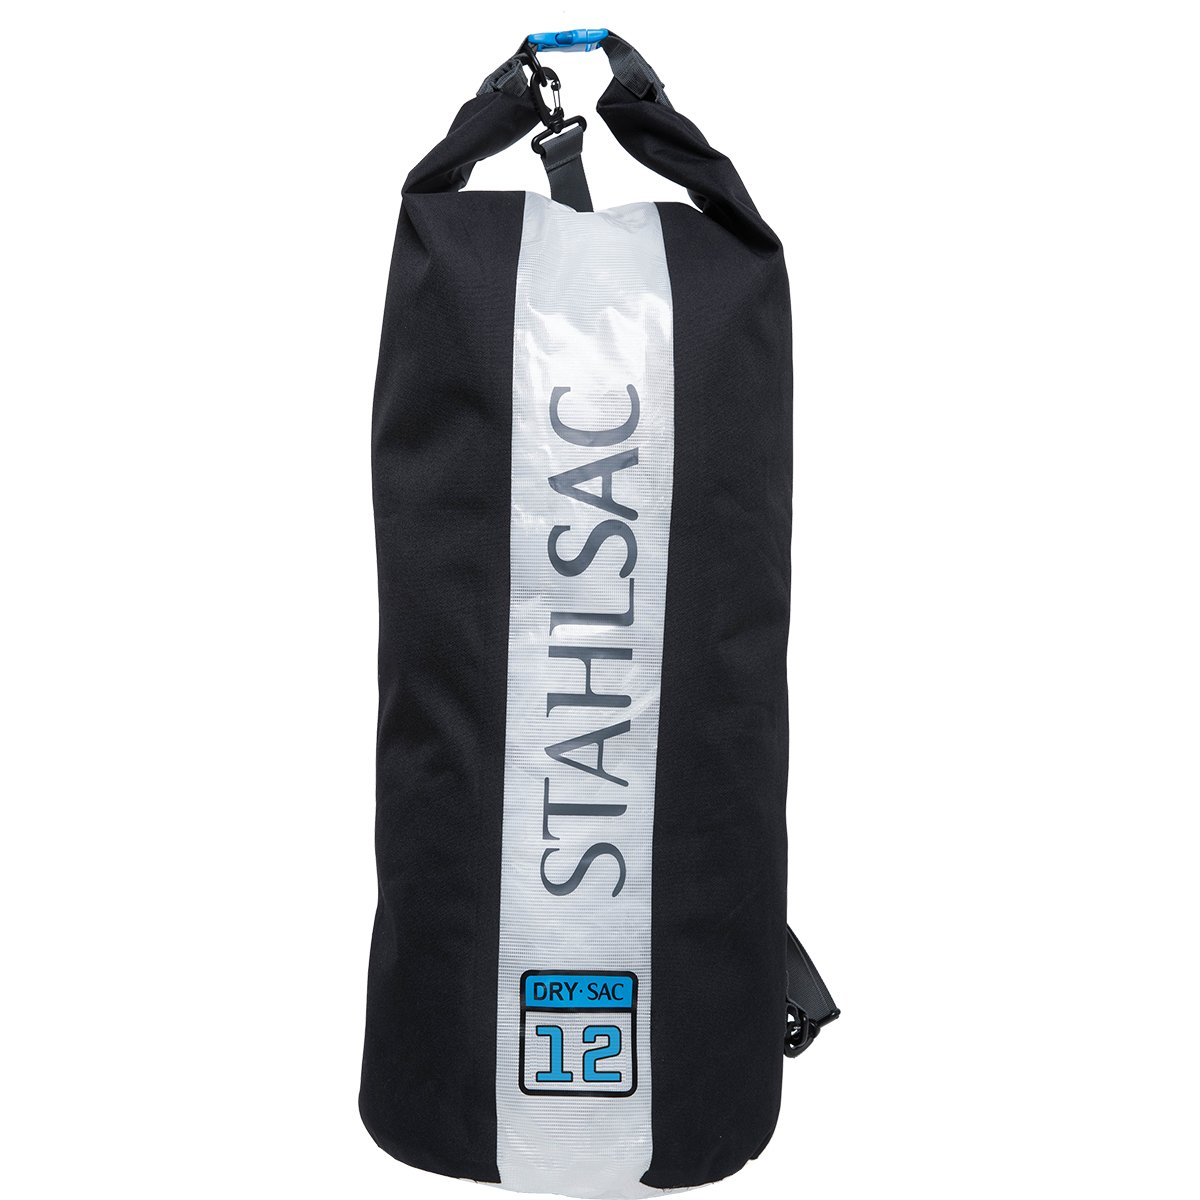 Stahlsac Storm Drybag